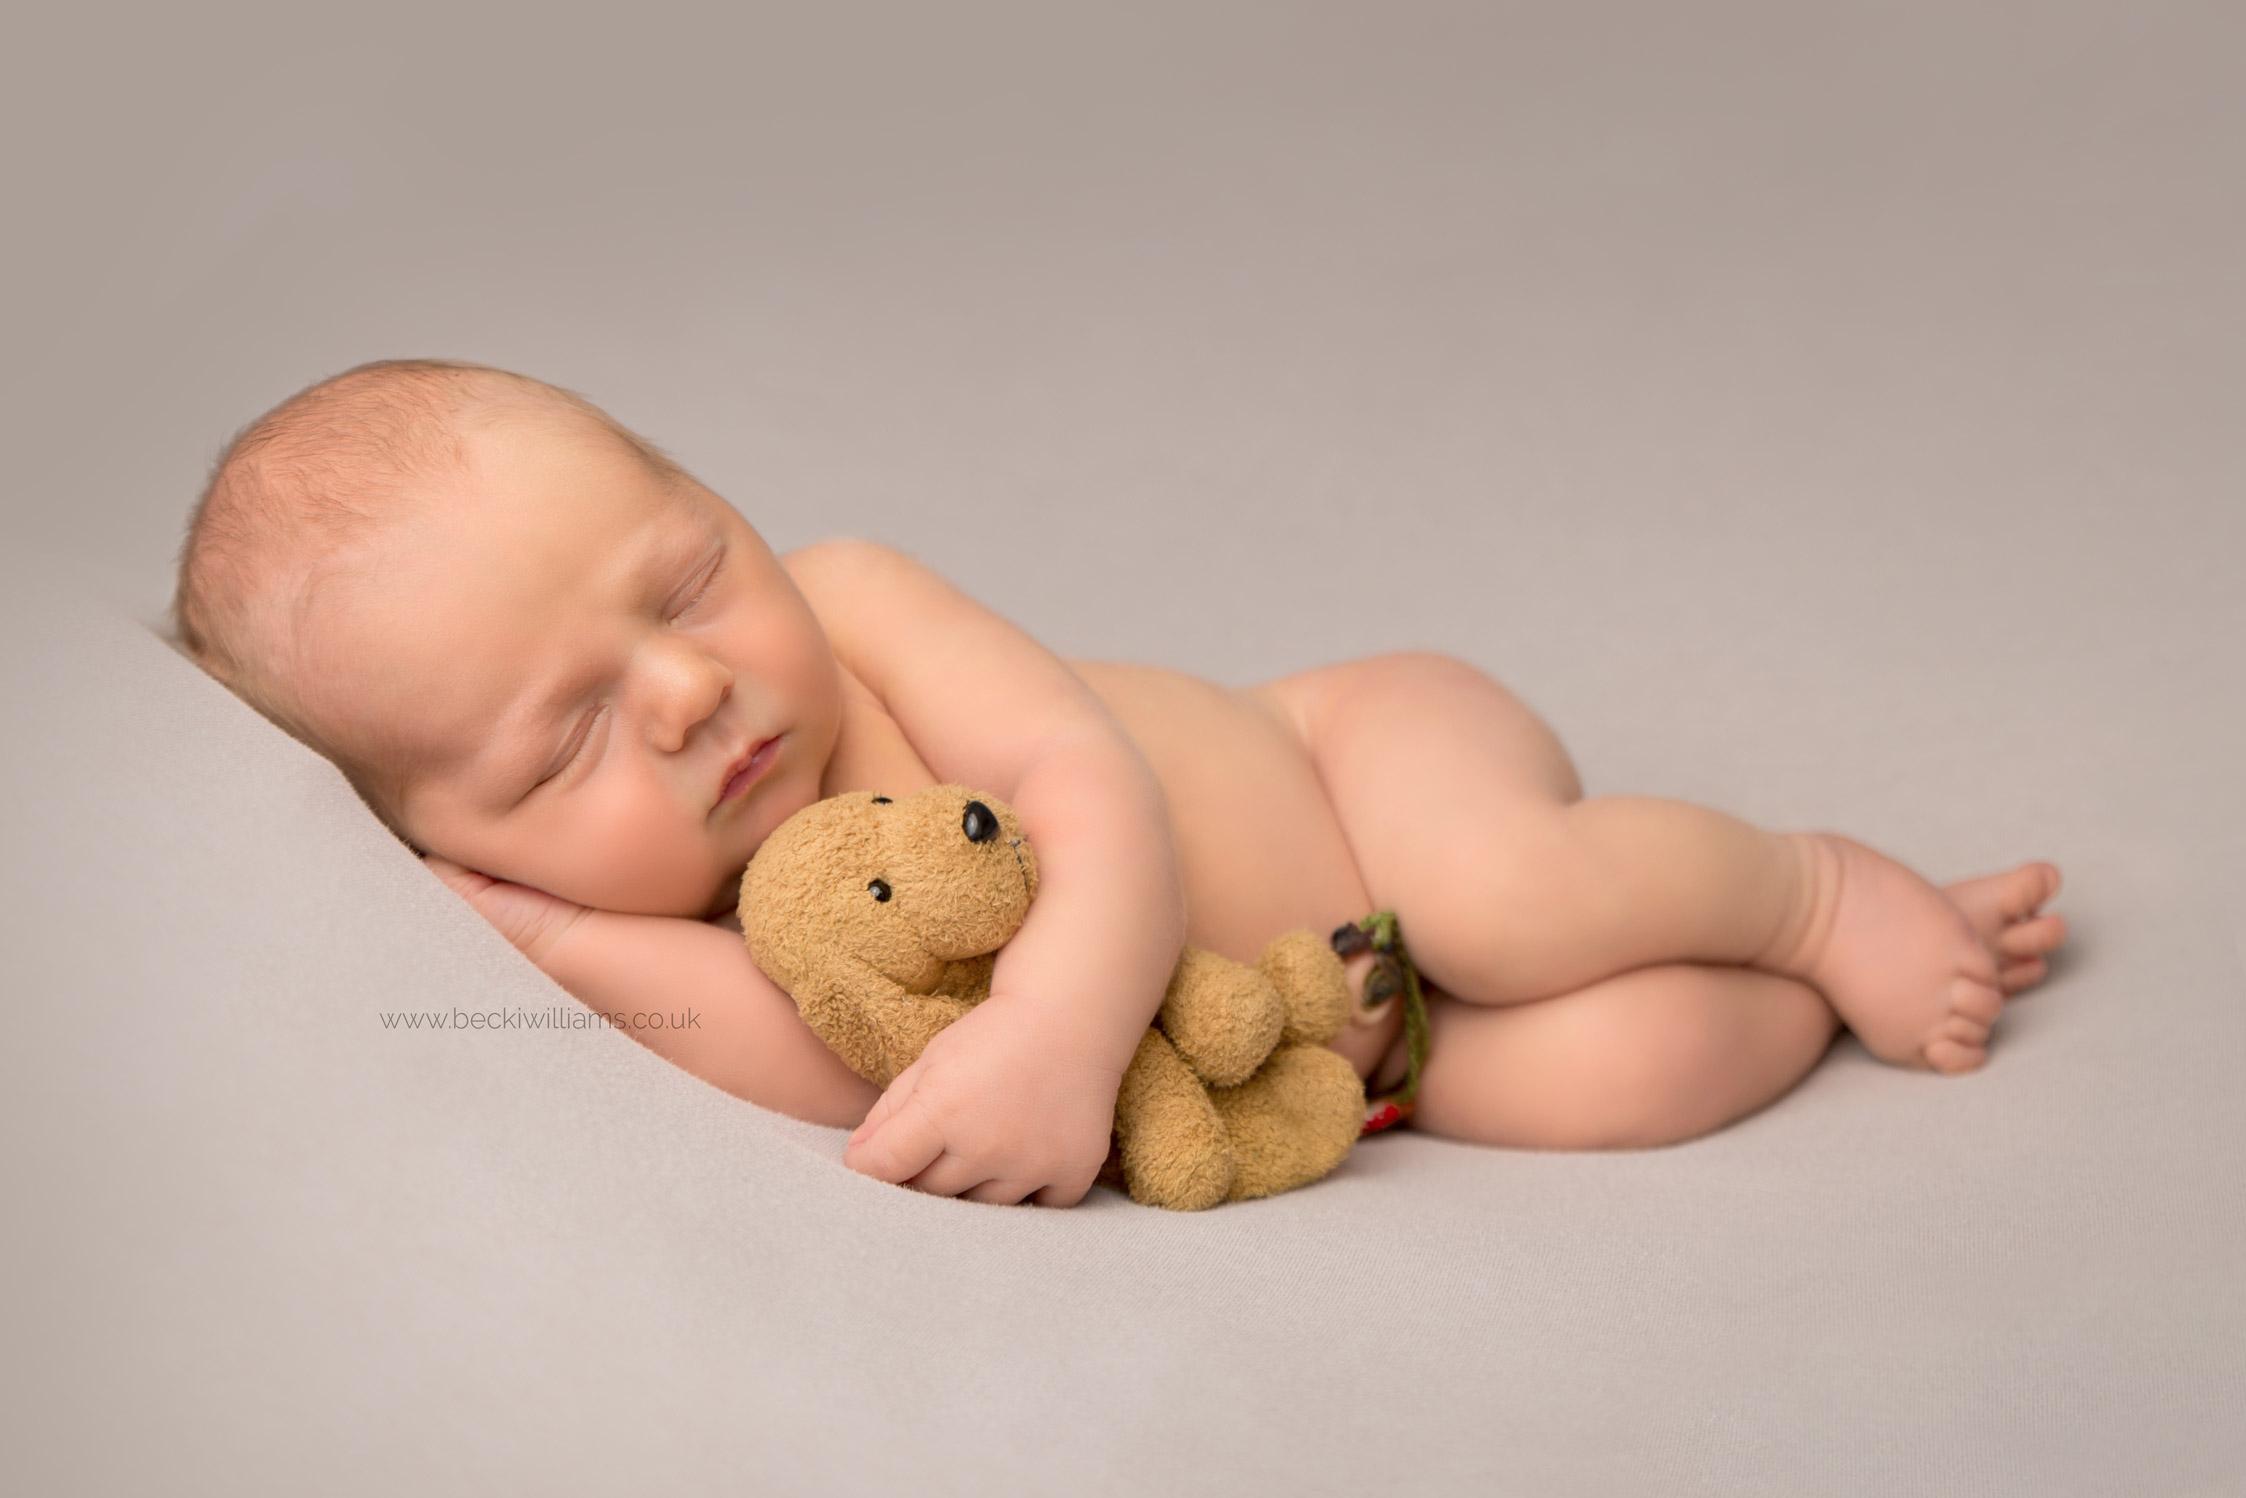 newborn baby boy laying asleep on his side at his newborn baby photo shoot in hemel hempstead